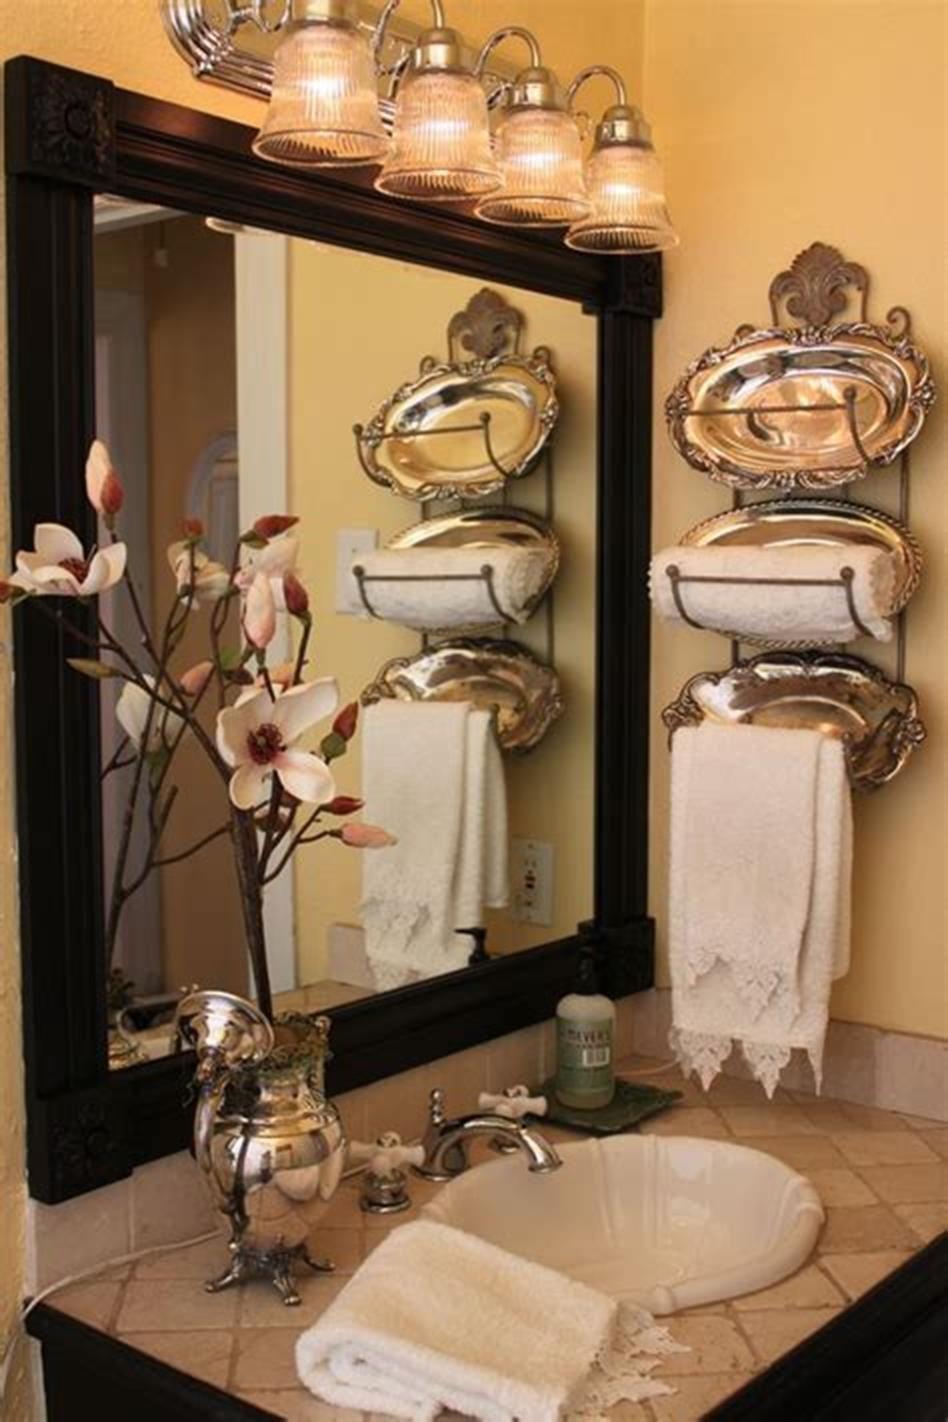 40 Beautiful Bathroom Vanity Tray Decor Ideas Decorecent Bathroom Decor Bathroom Mirror Makeover Home Decor [ 1422 x 948 Pixel ]